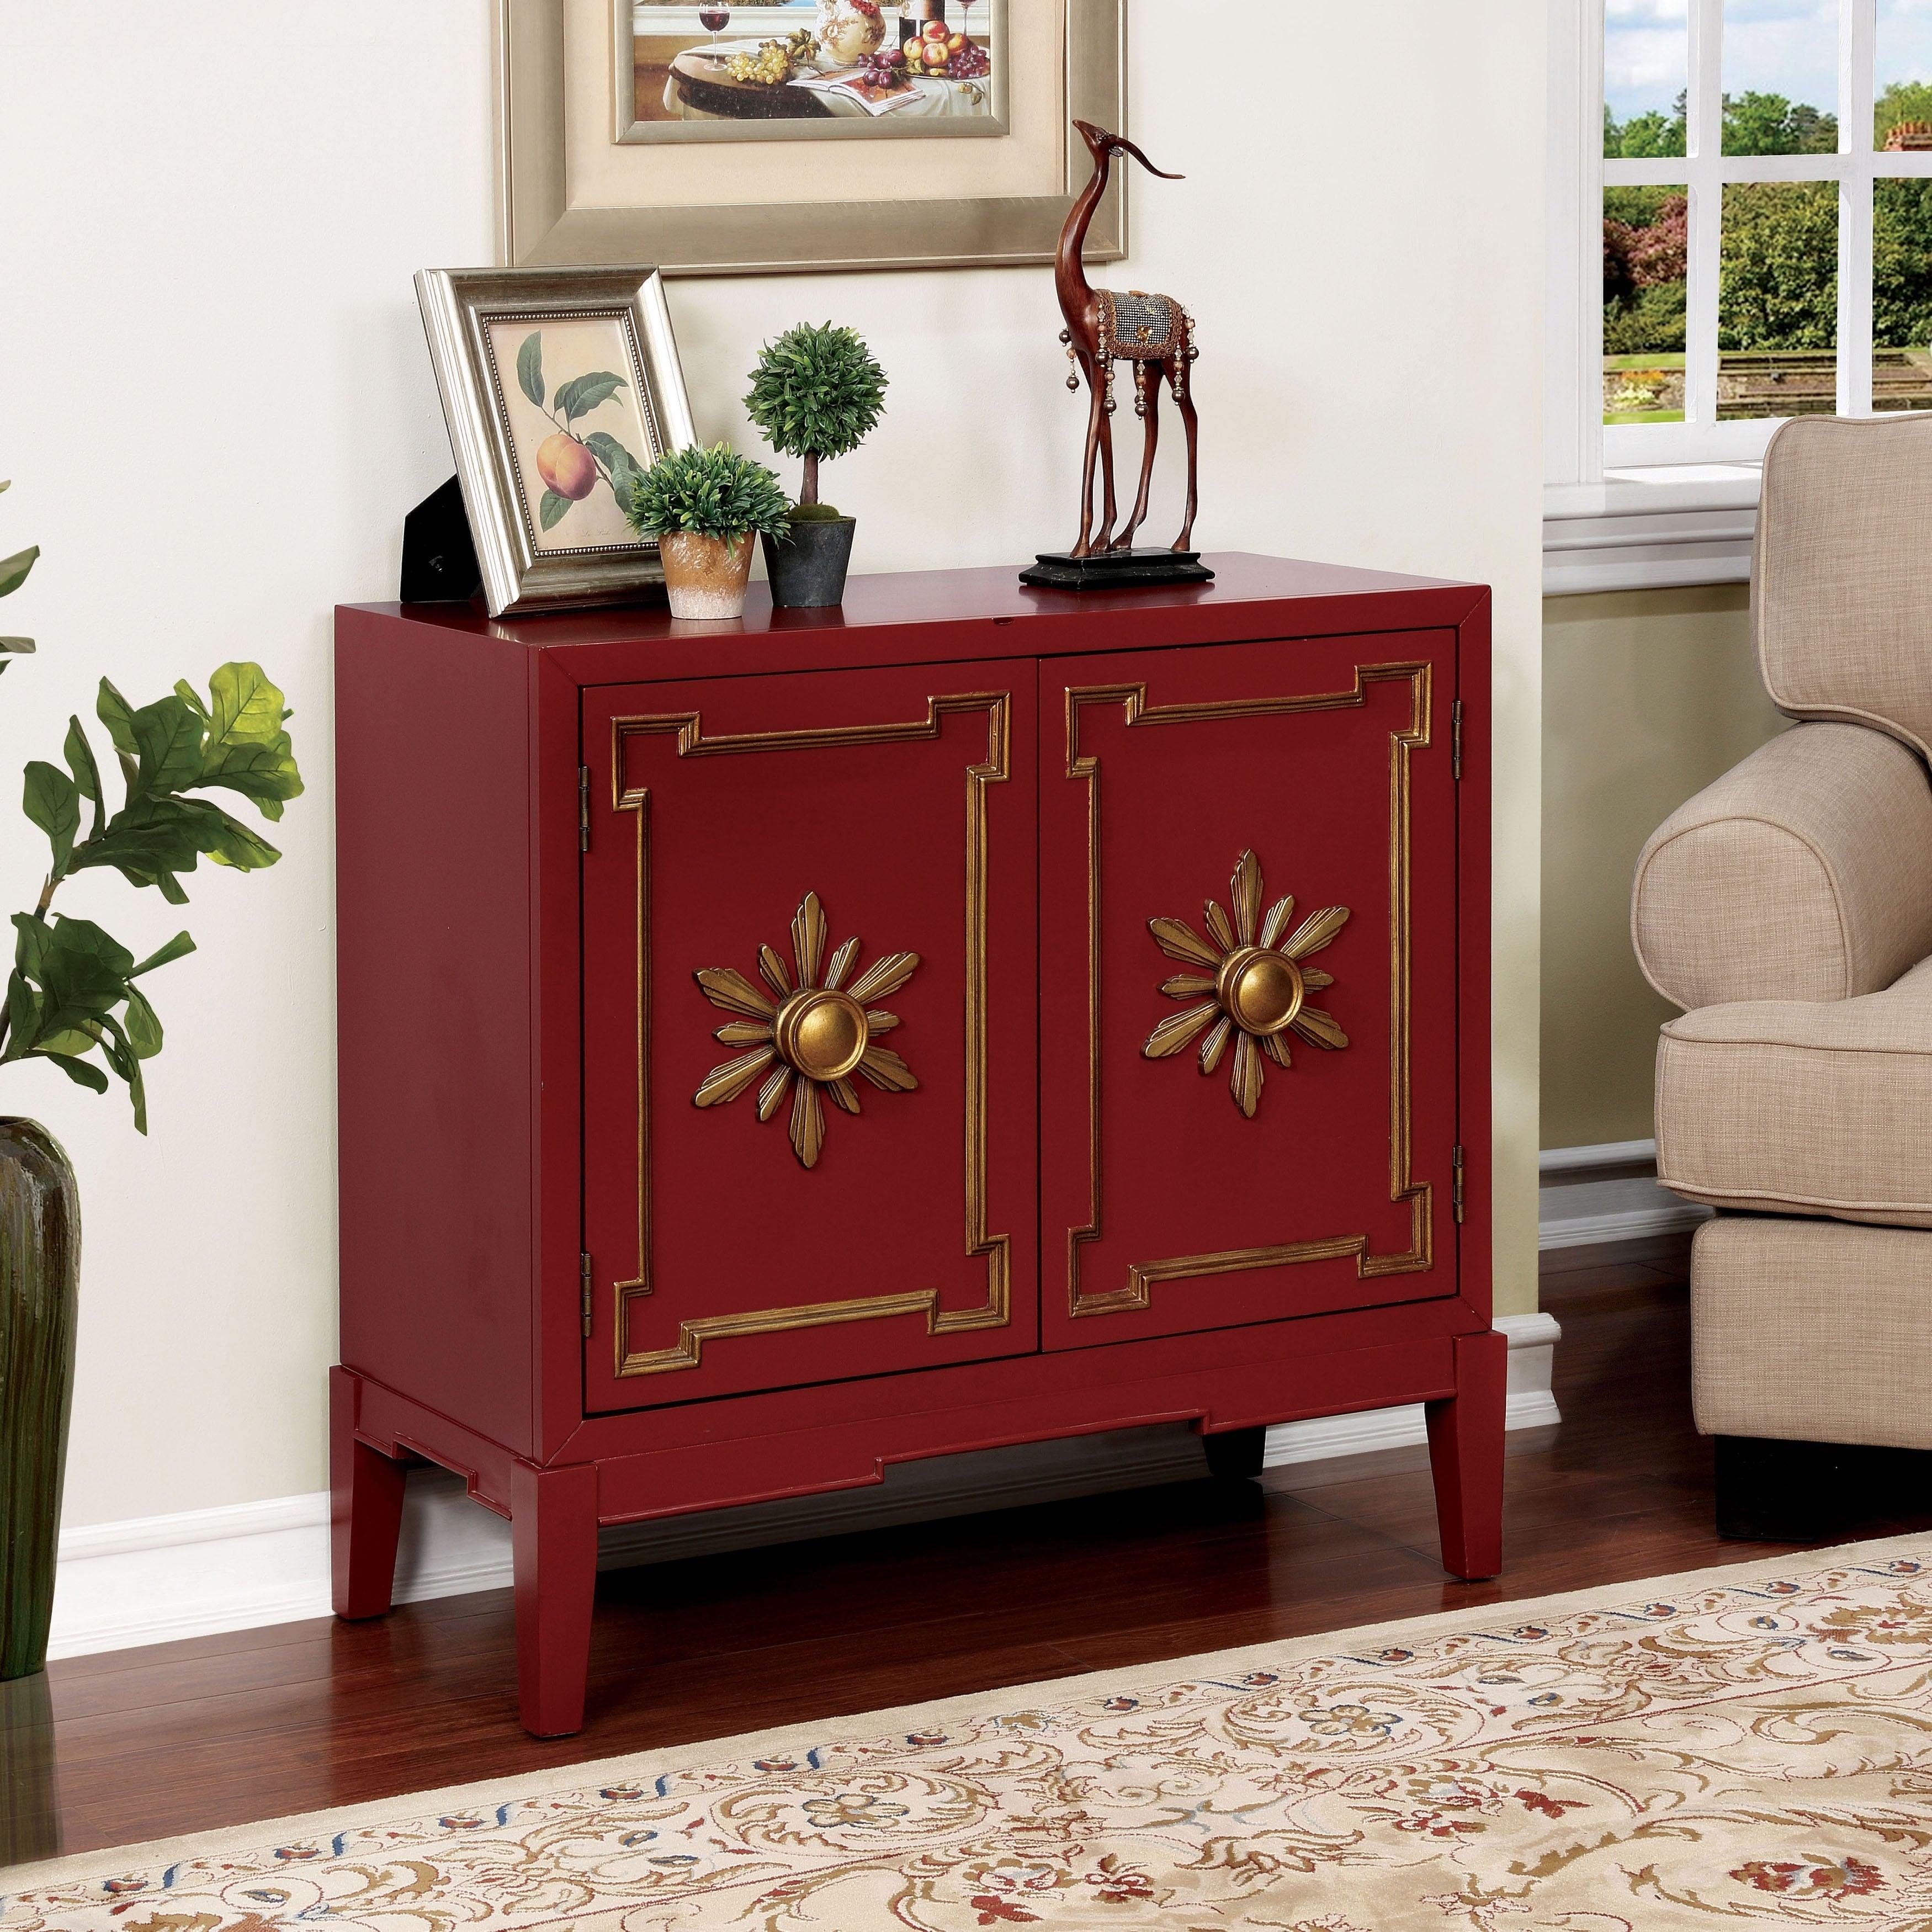 Furniture of America Kerla Vintage 2-shelf Hallway Storag...